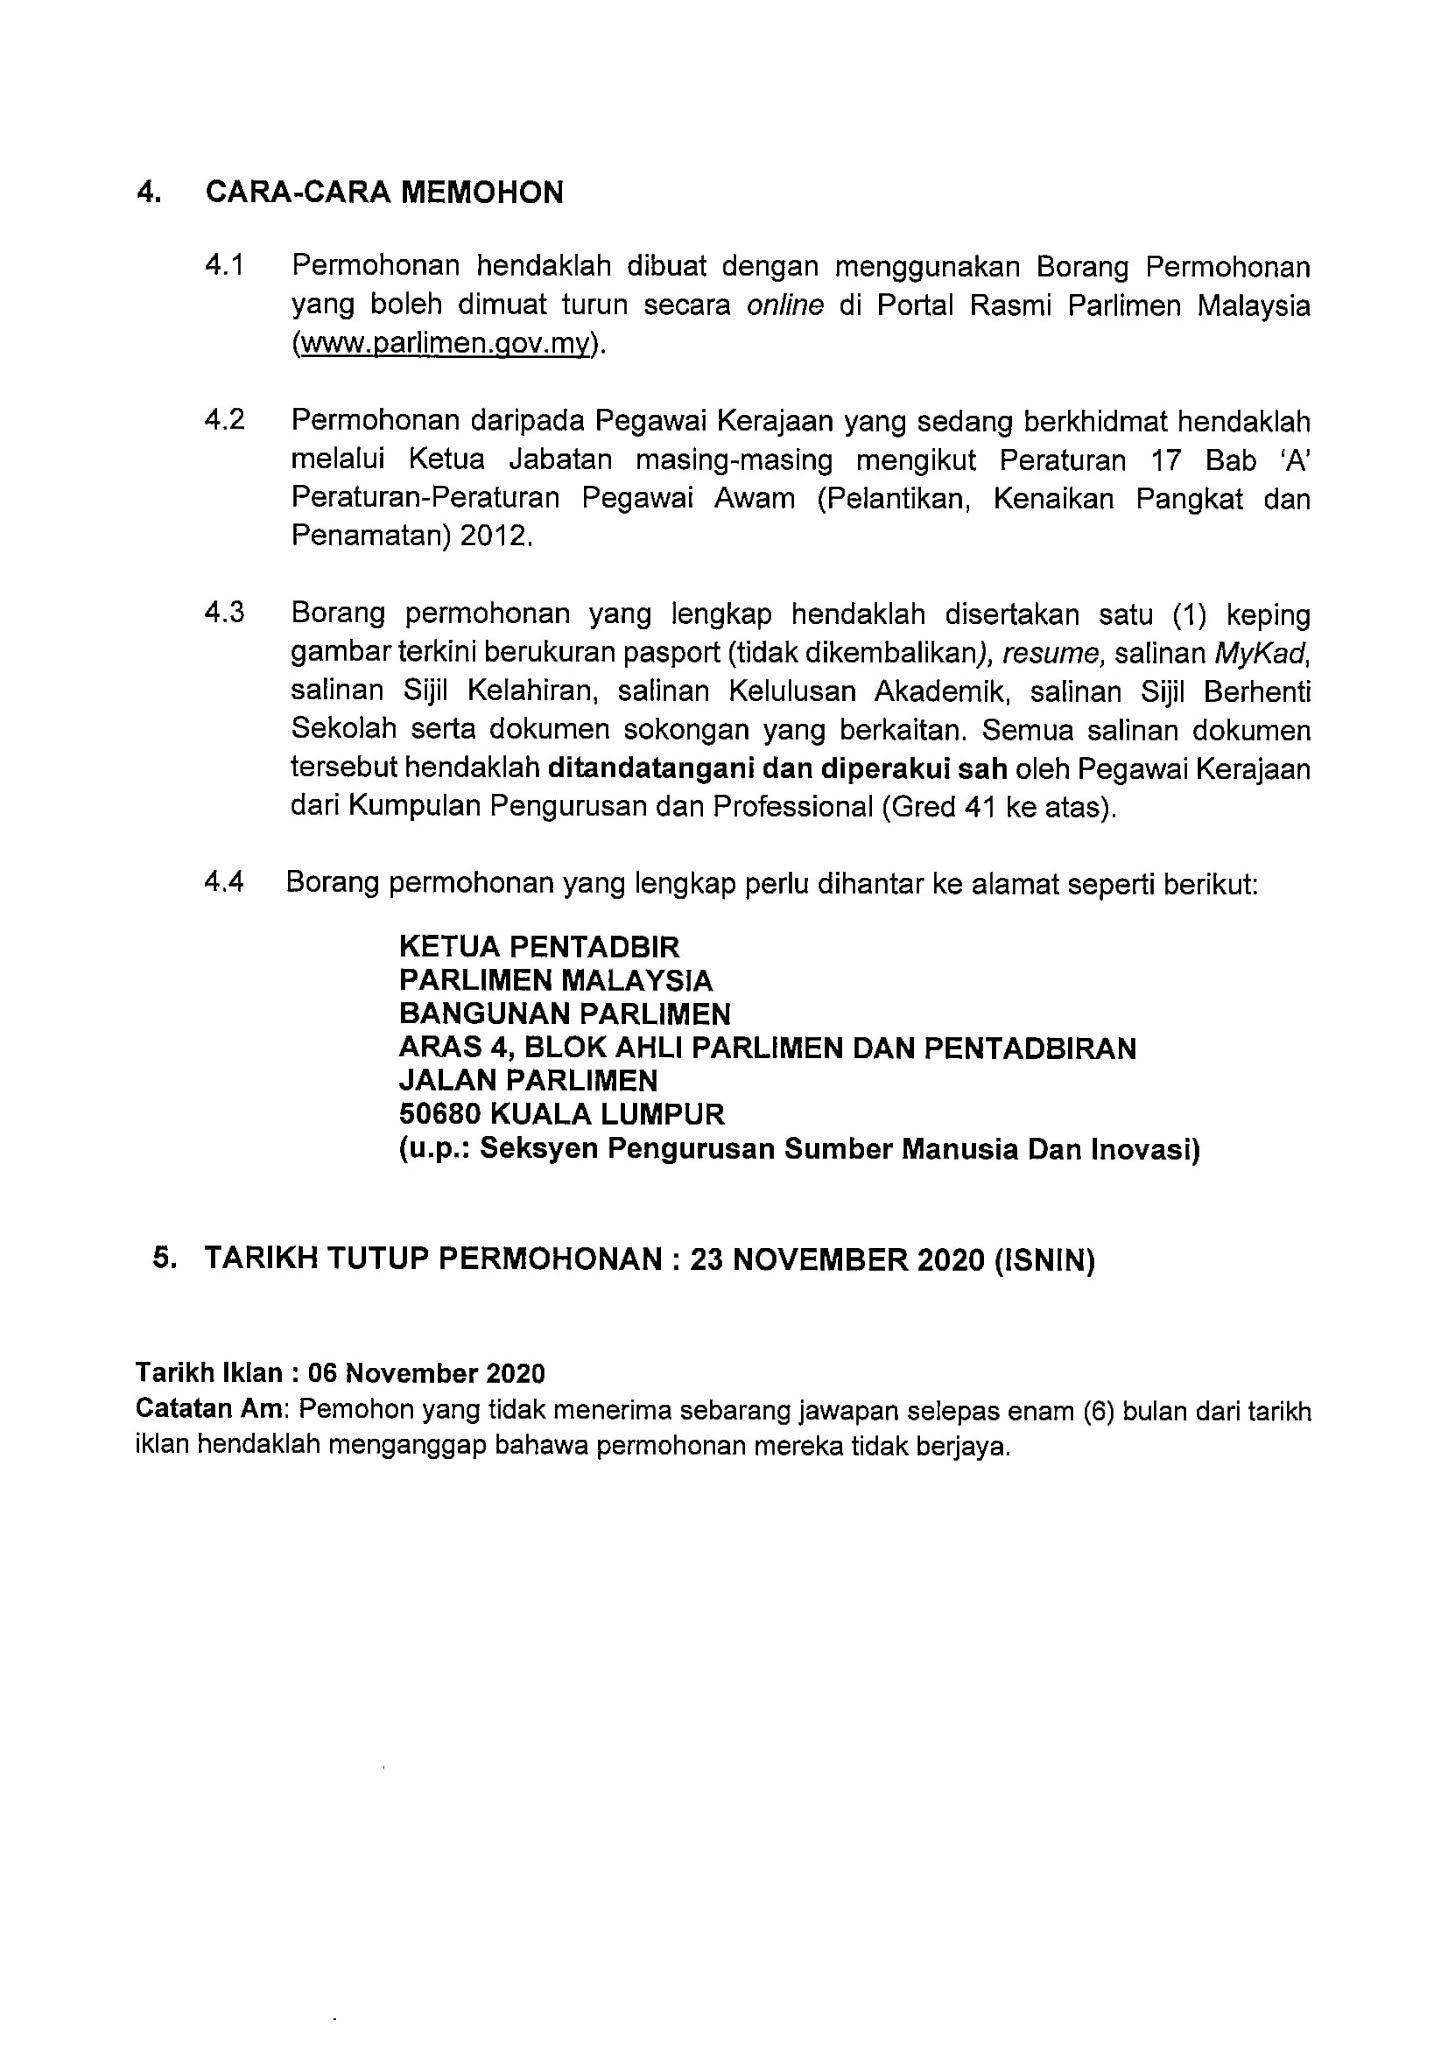 Jawatan Kosong di Parlimen Malaysia - 23 November 2020 ...